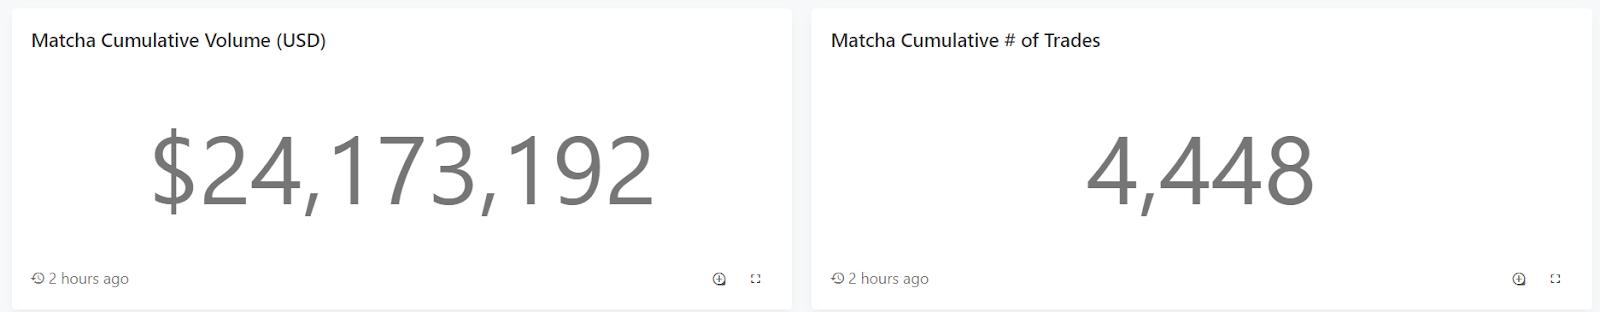 Cumulative Volume on Matcha